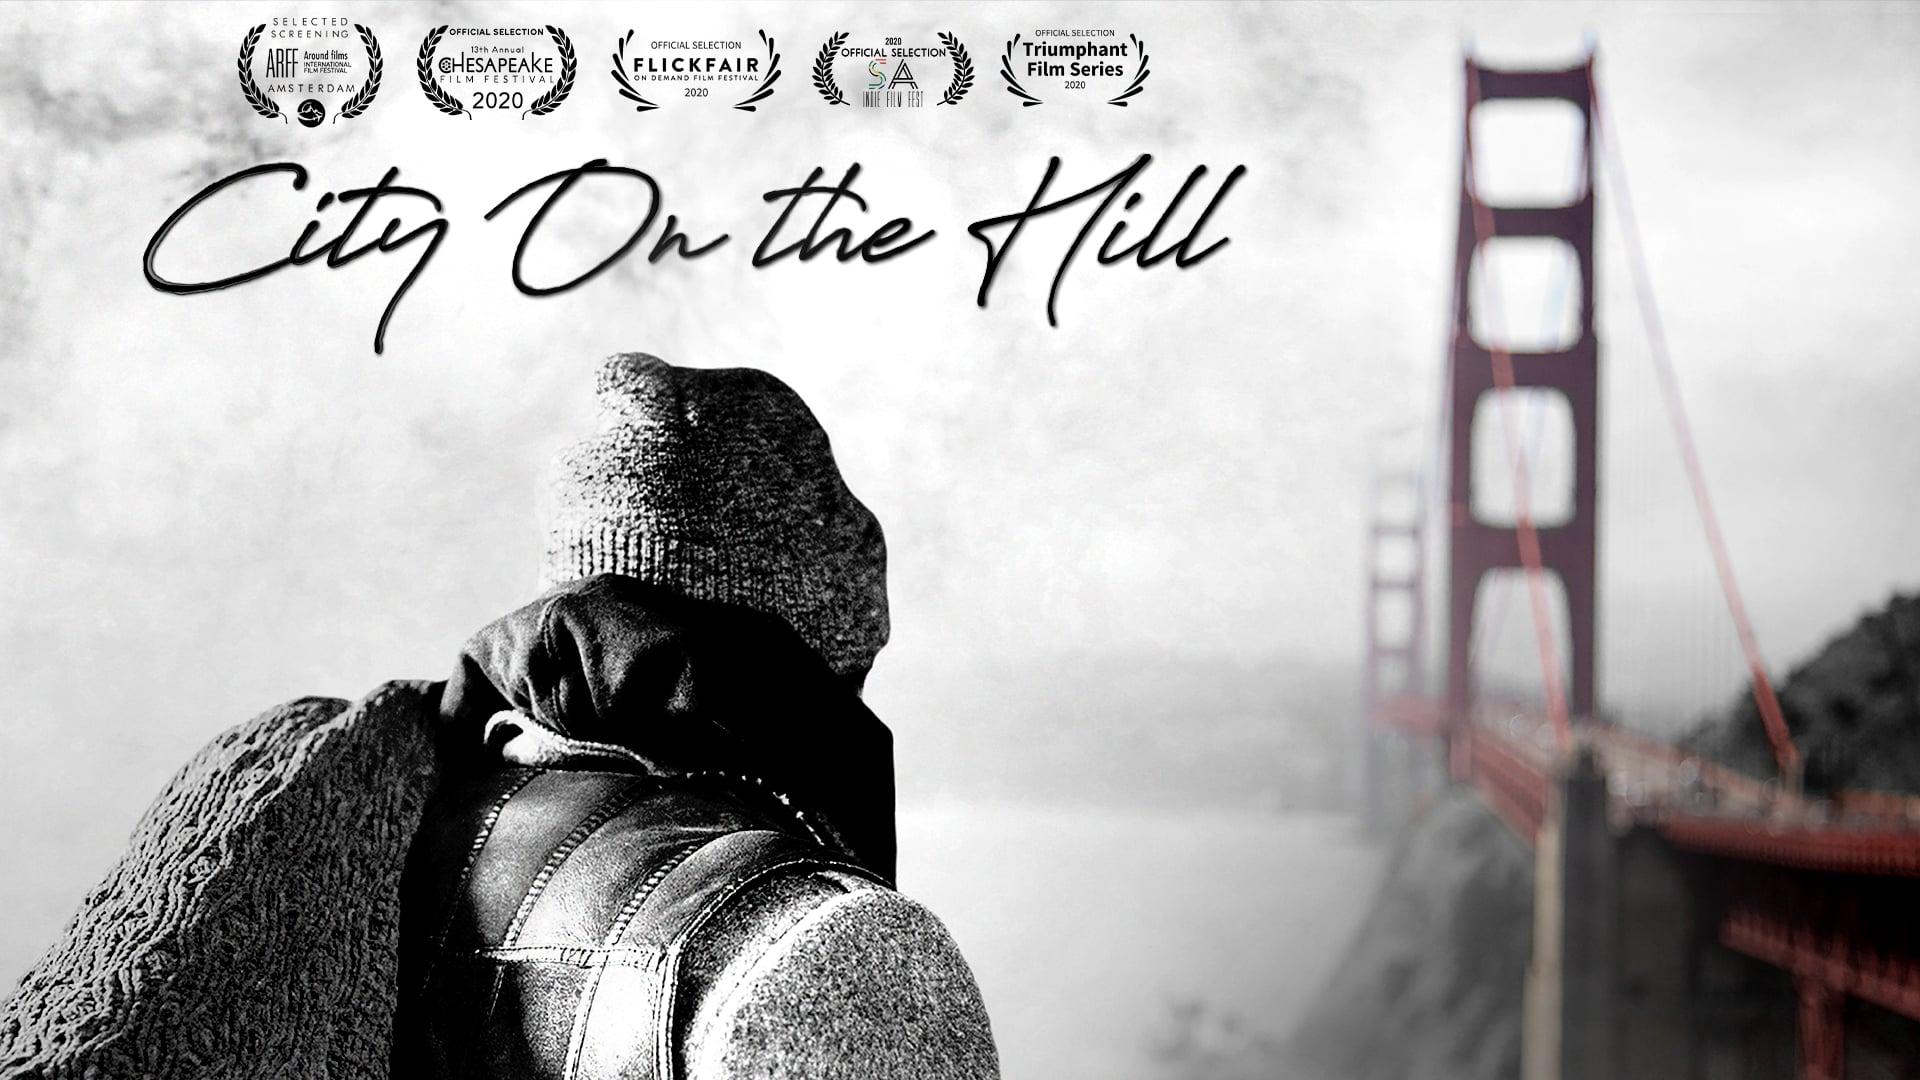 City On the Hill Teaser/Trailer